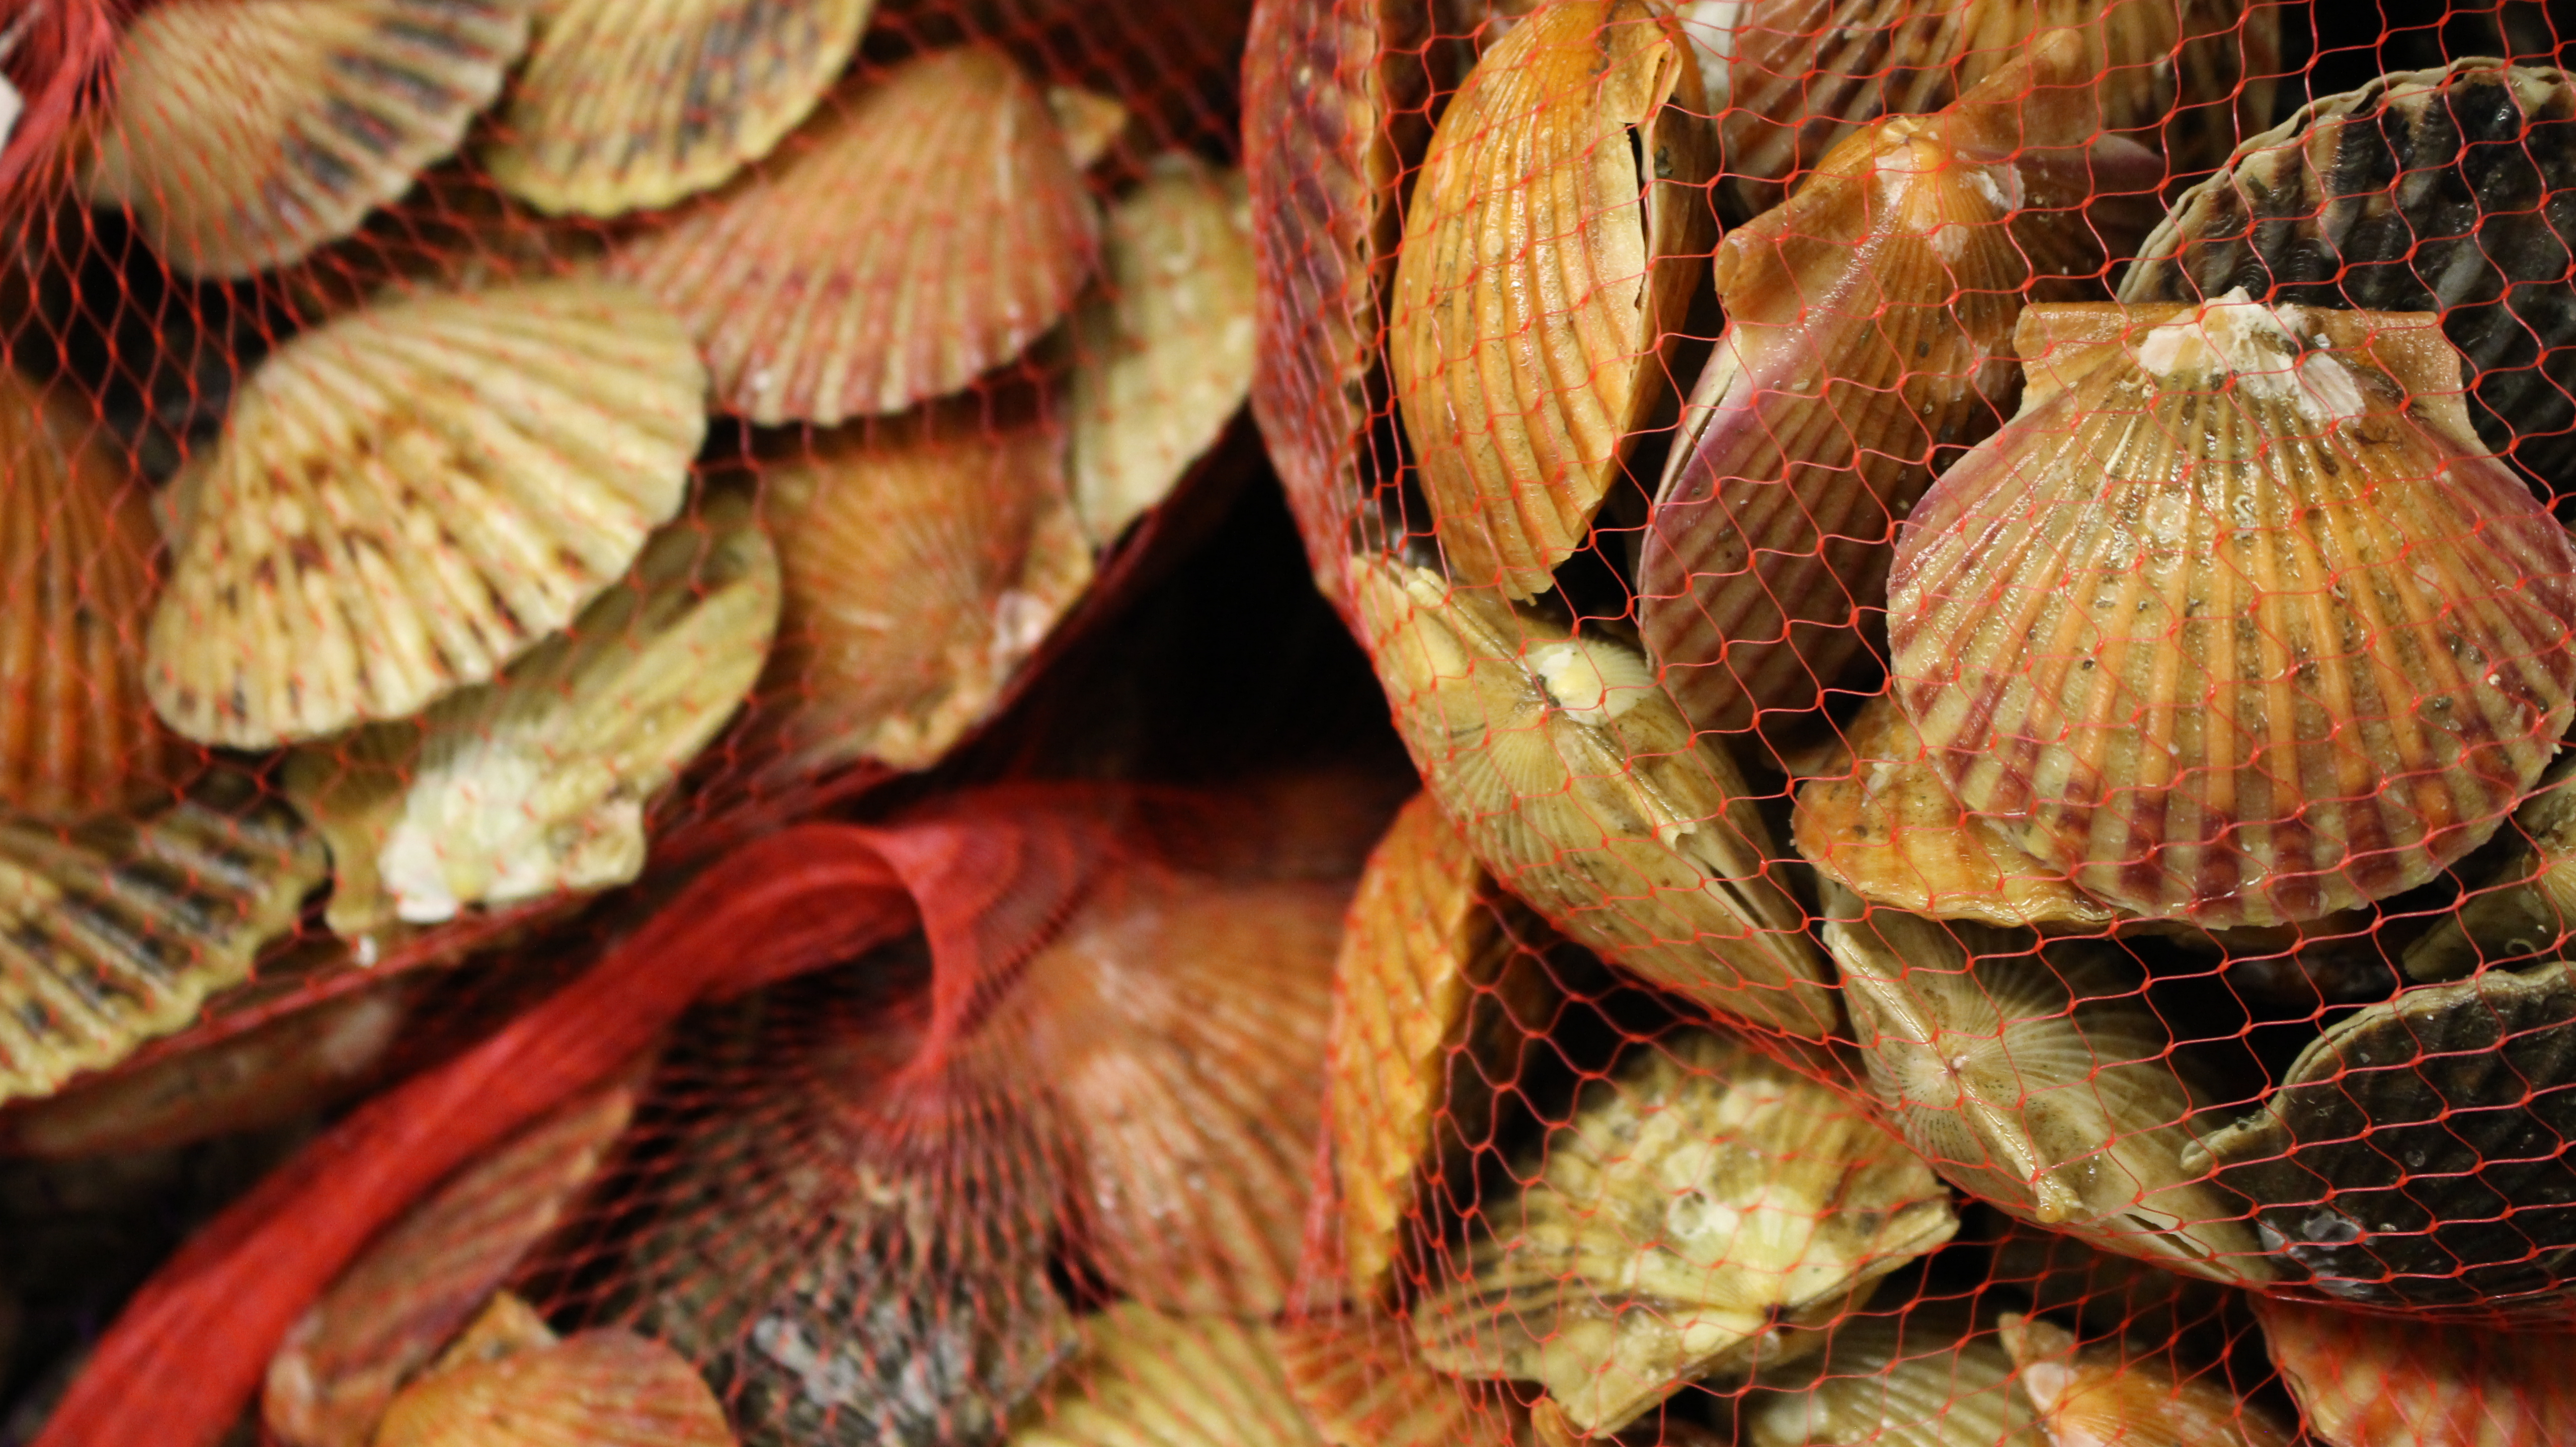 Tis the Season for Shellfish